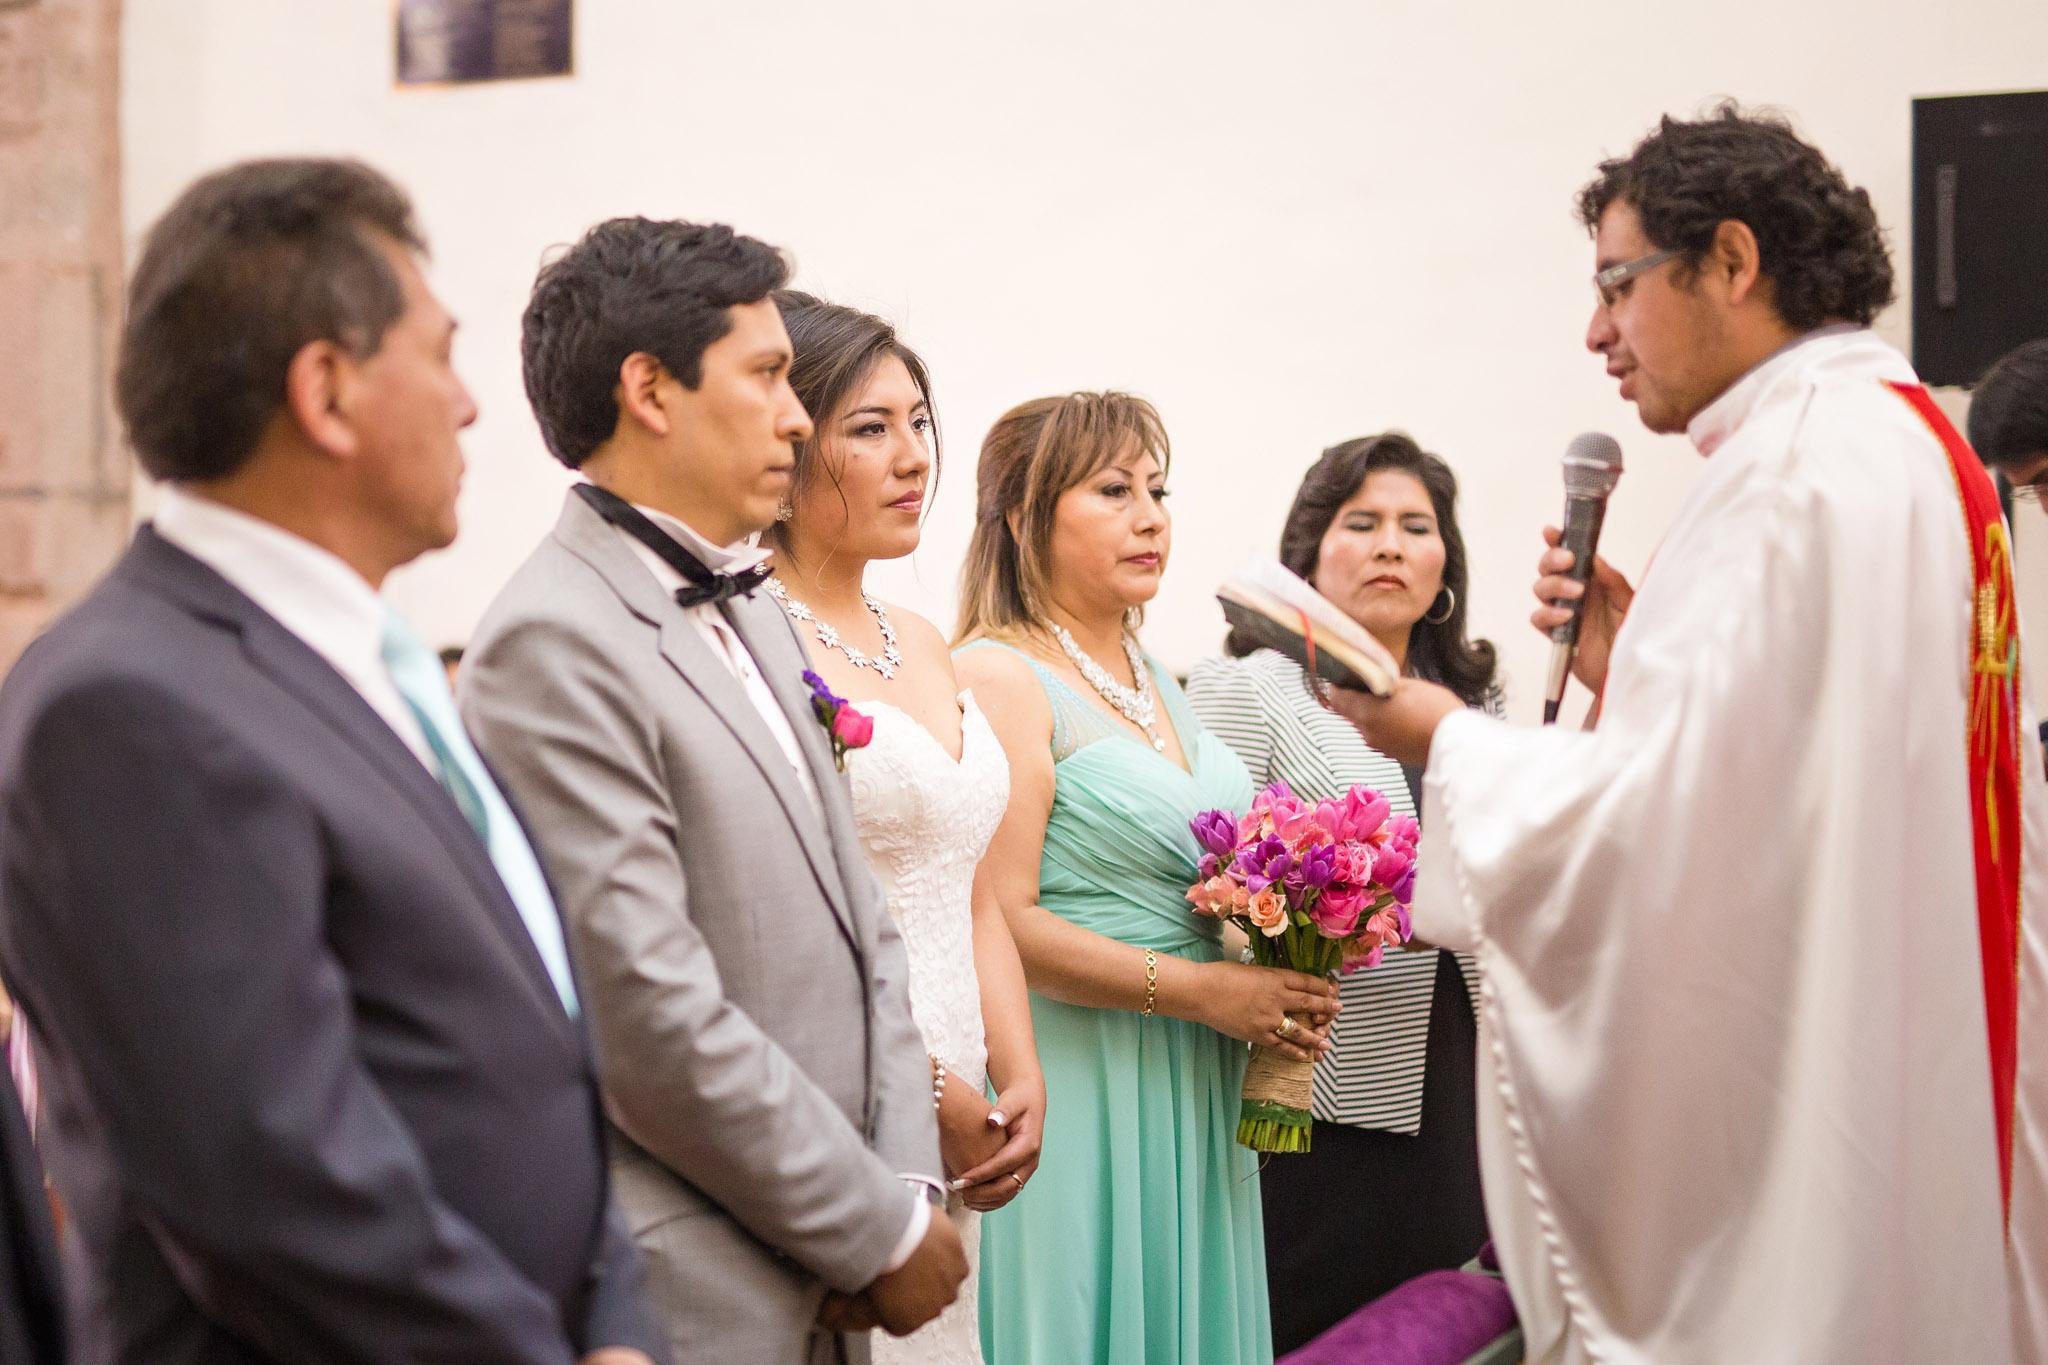 Wedding-Travellers-Destination-Wedding-Peru-Cusco-Hacienda-Sarapampa-Sacred-Valley-church